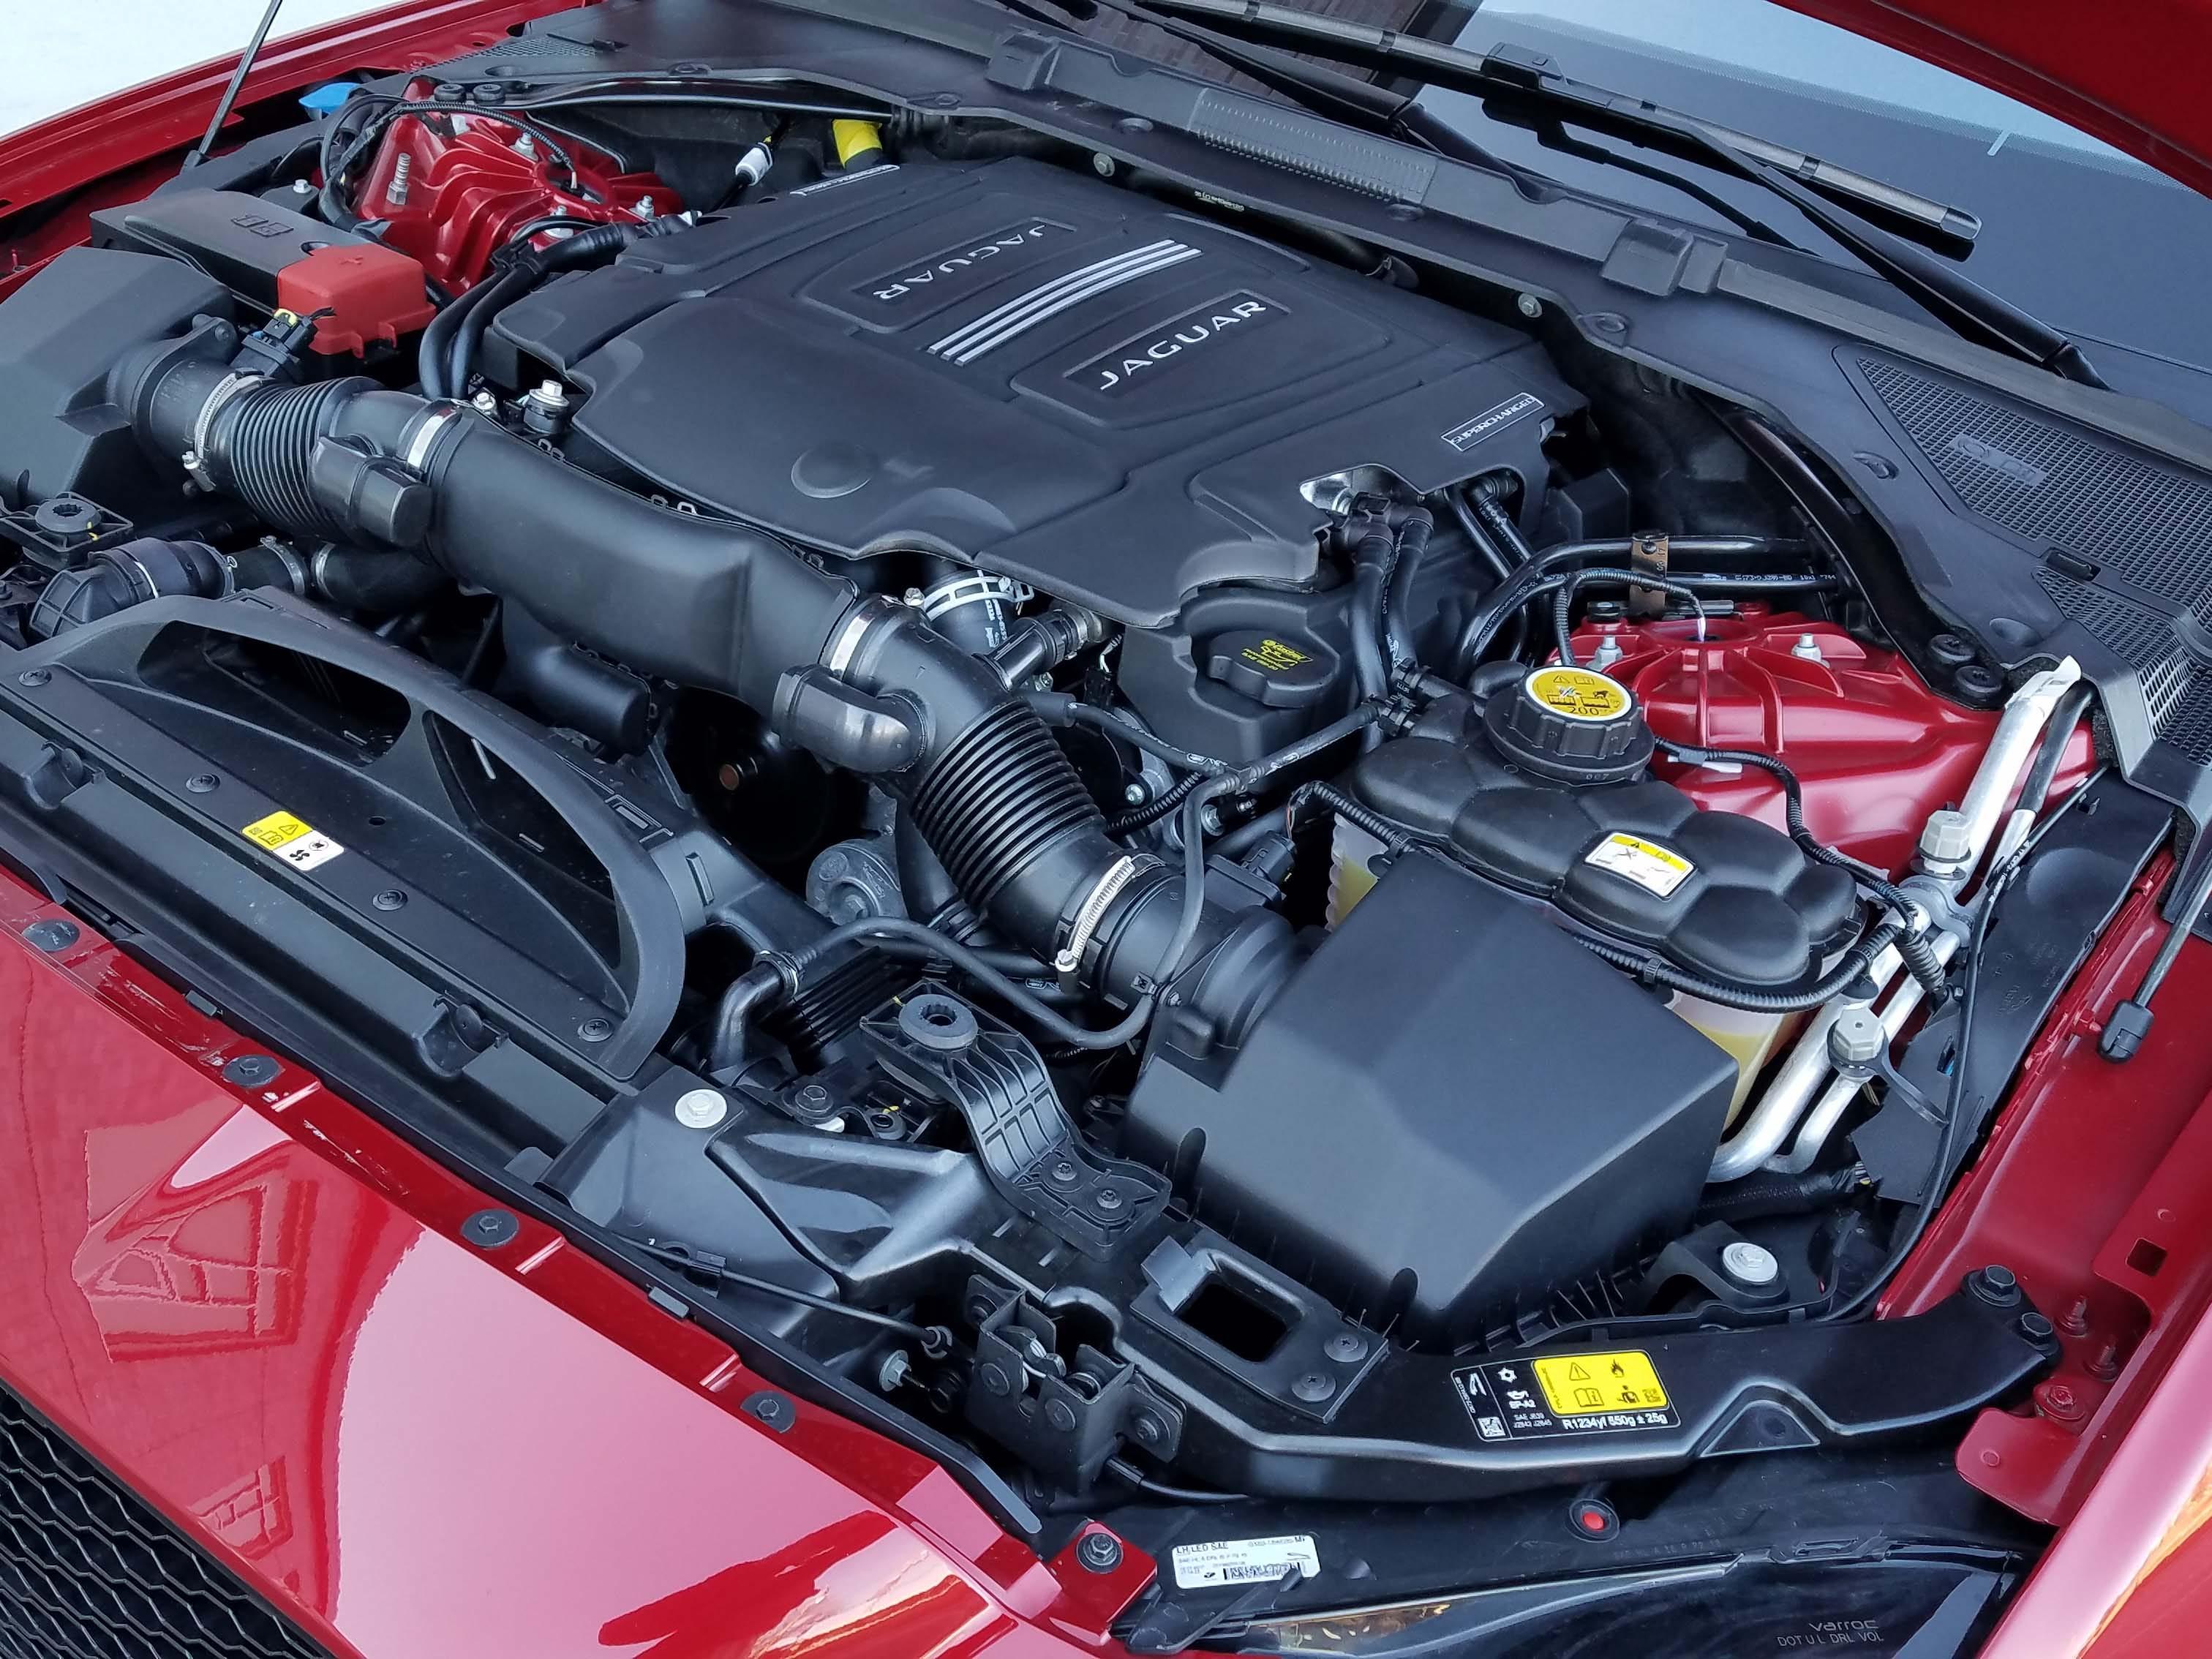 Lotsa oomph. The Jaguar XF Sportbrake packs a supercharged, 3.0-liter V-6 under the hood — good for 380 horsepower.